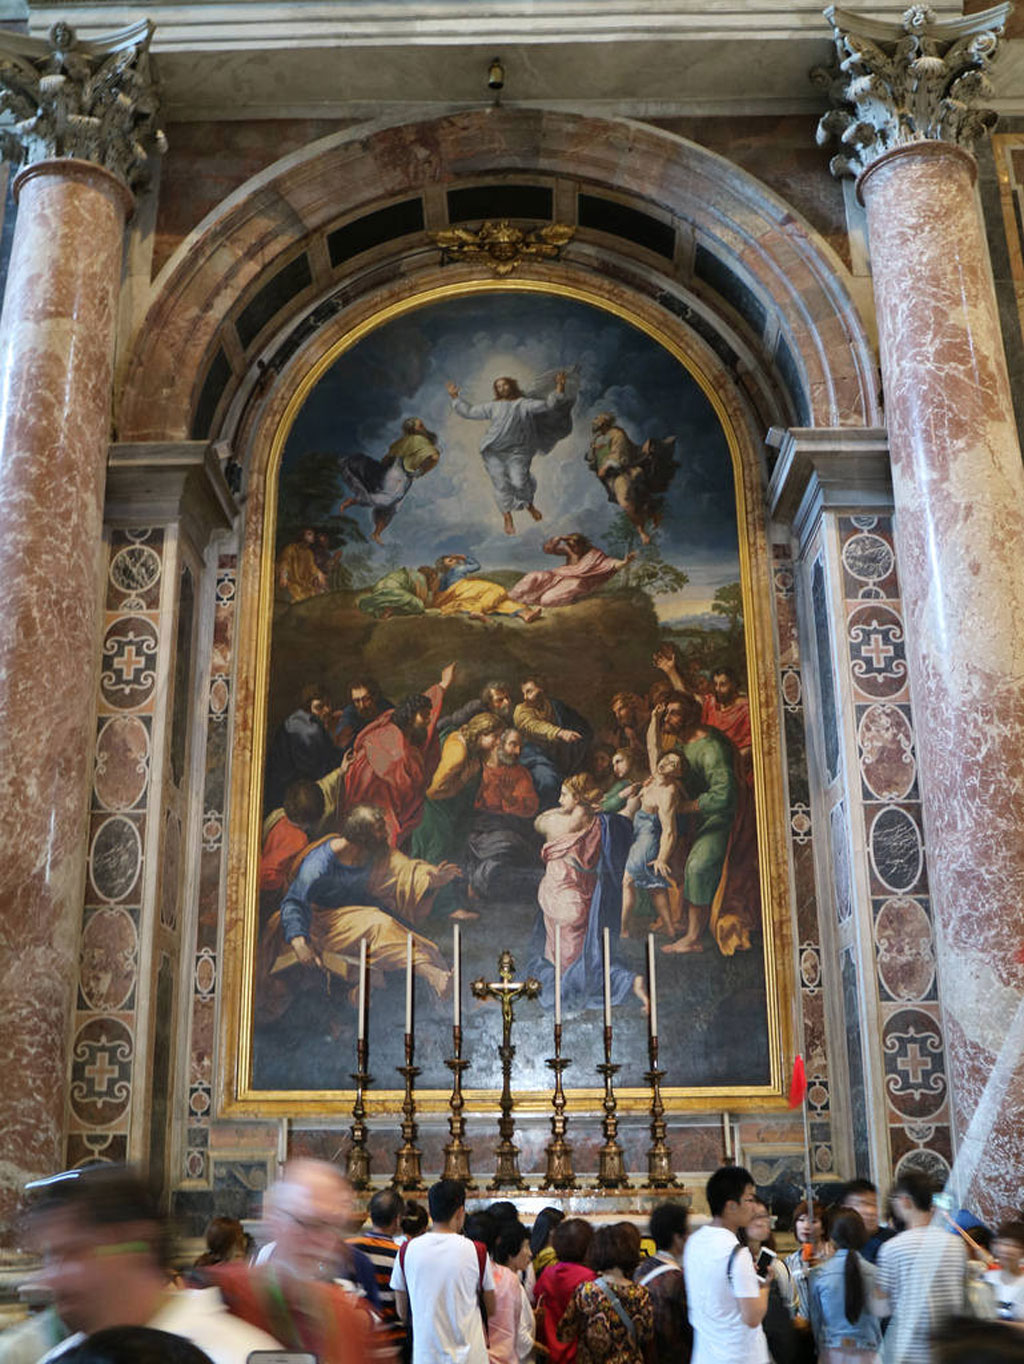 محراب تبدل عیسی کپی موزائیک نقاشی رافائل